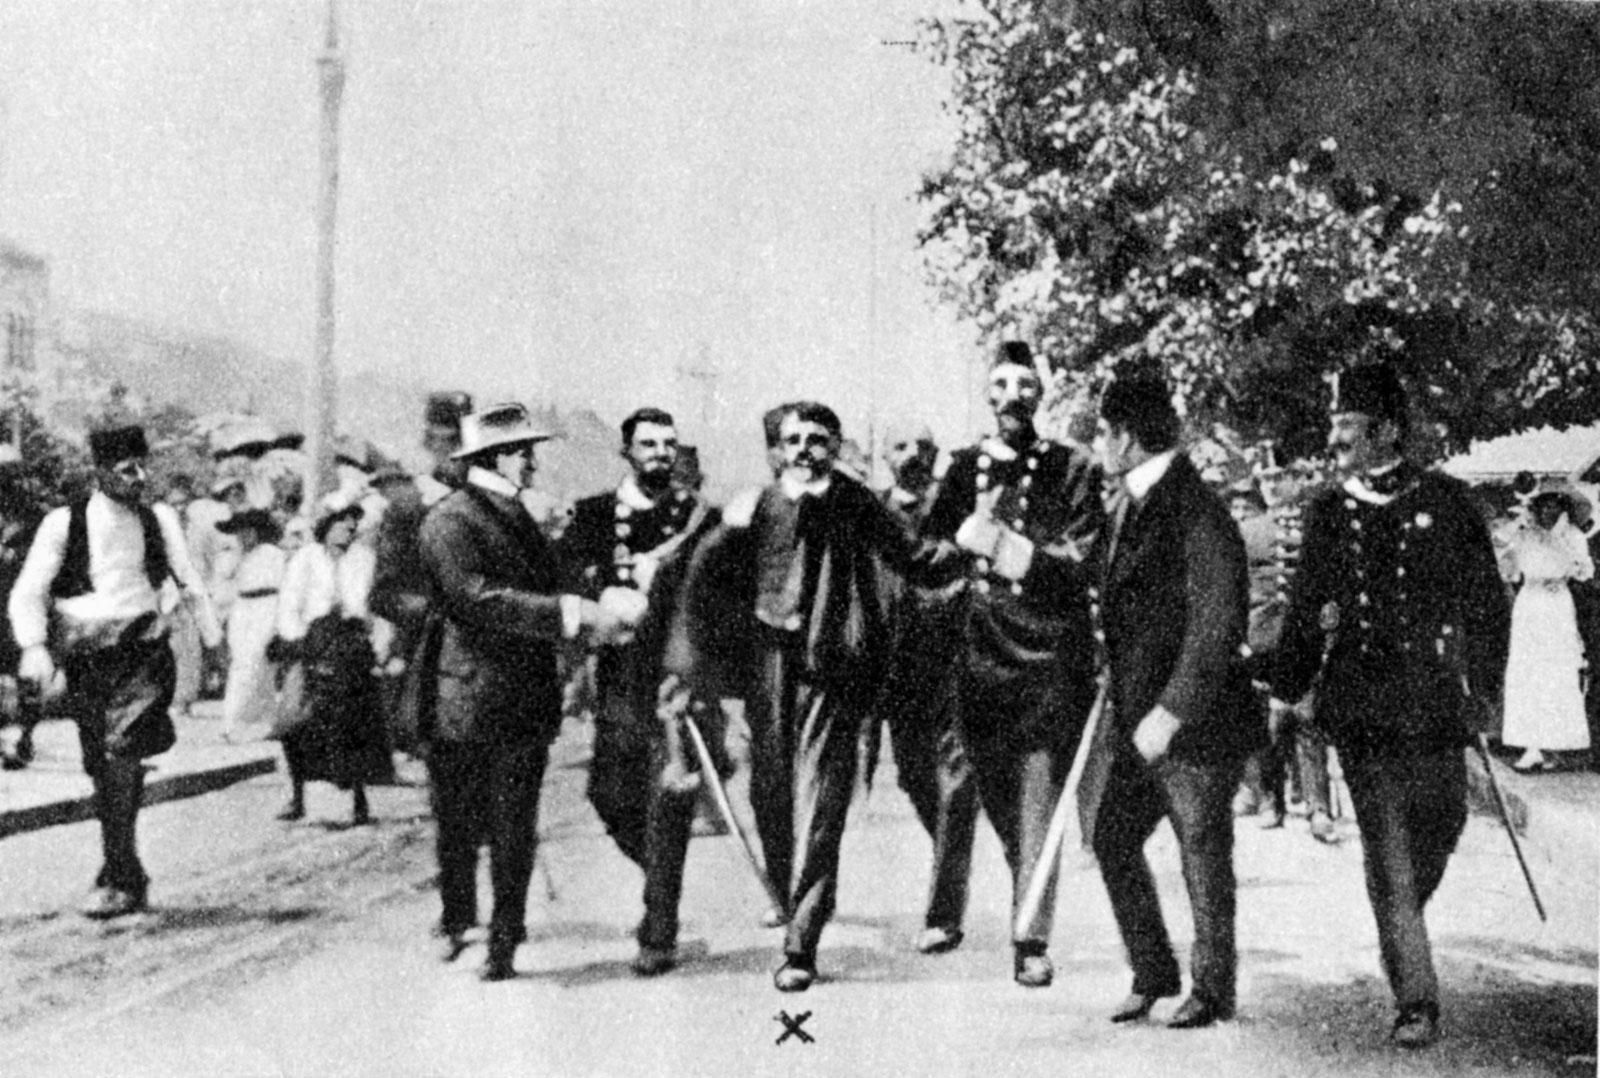 arrest-gavrilo-princip-1914.jpg